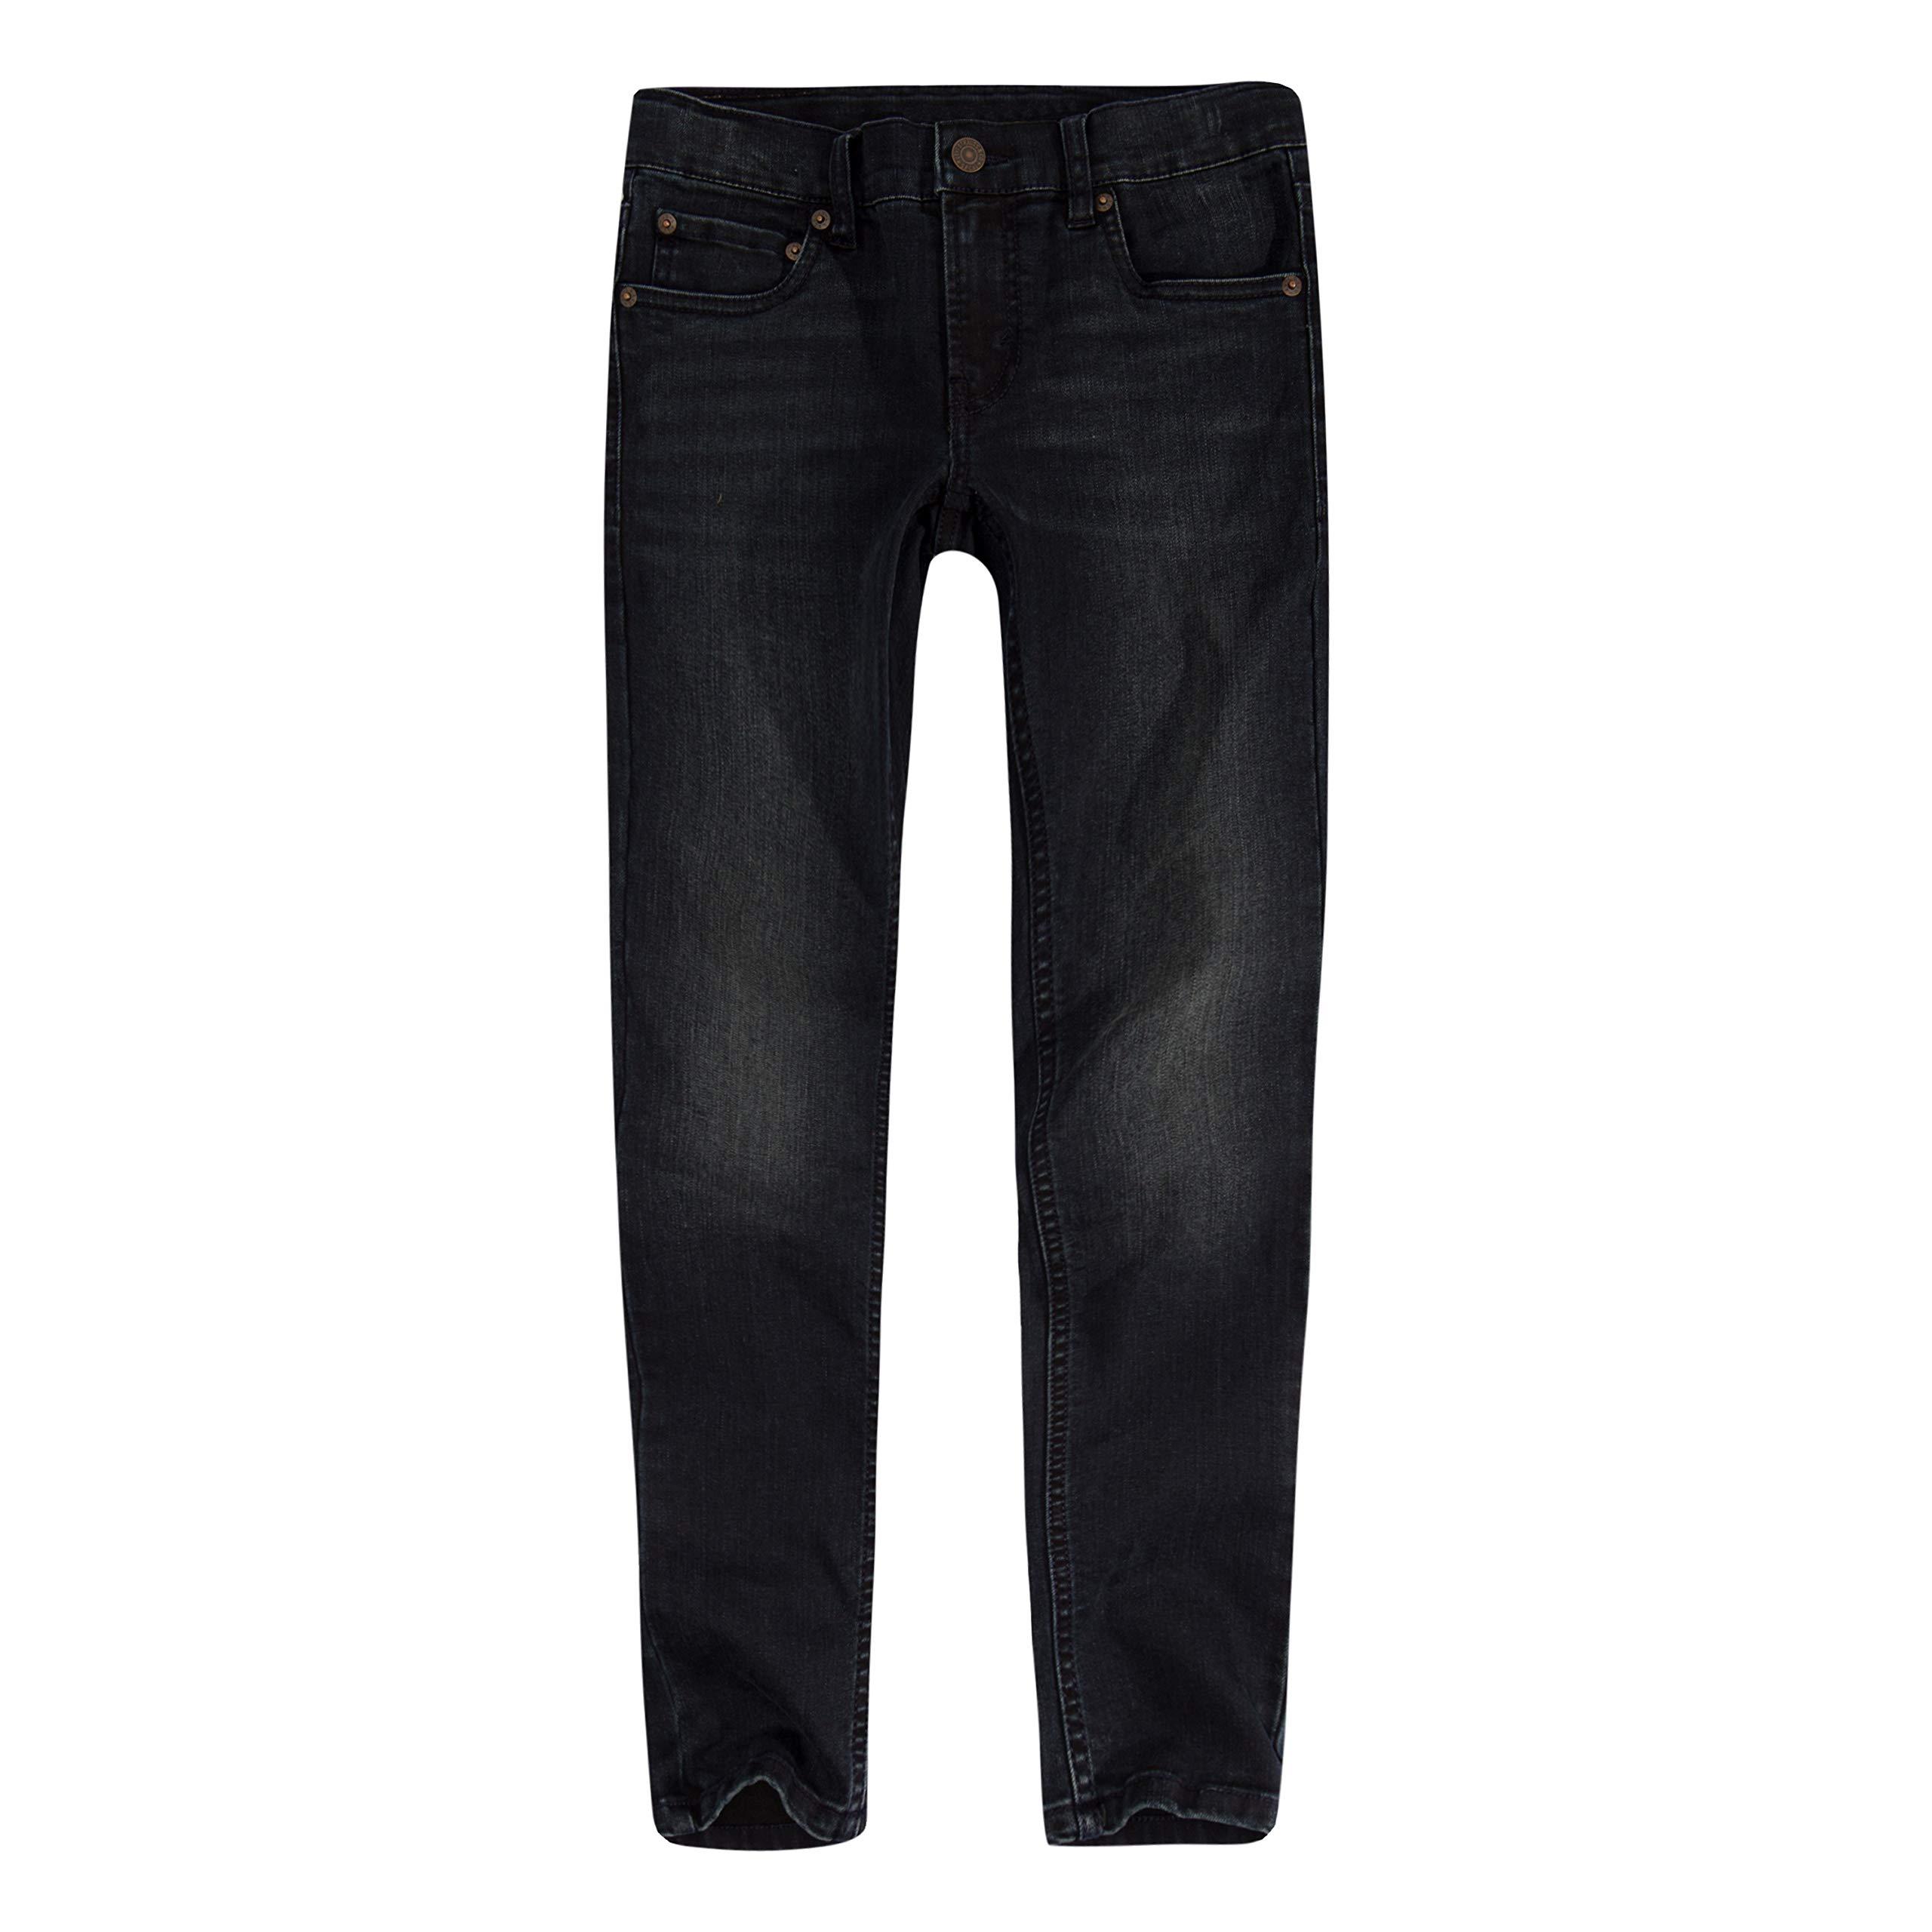 Levi's Boys' Big 519 Extreme Skinny Fit Jeans, Nightswatch, 12